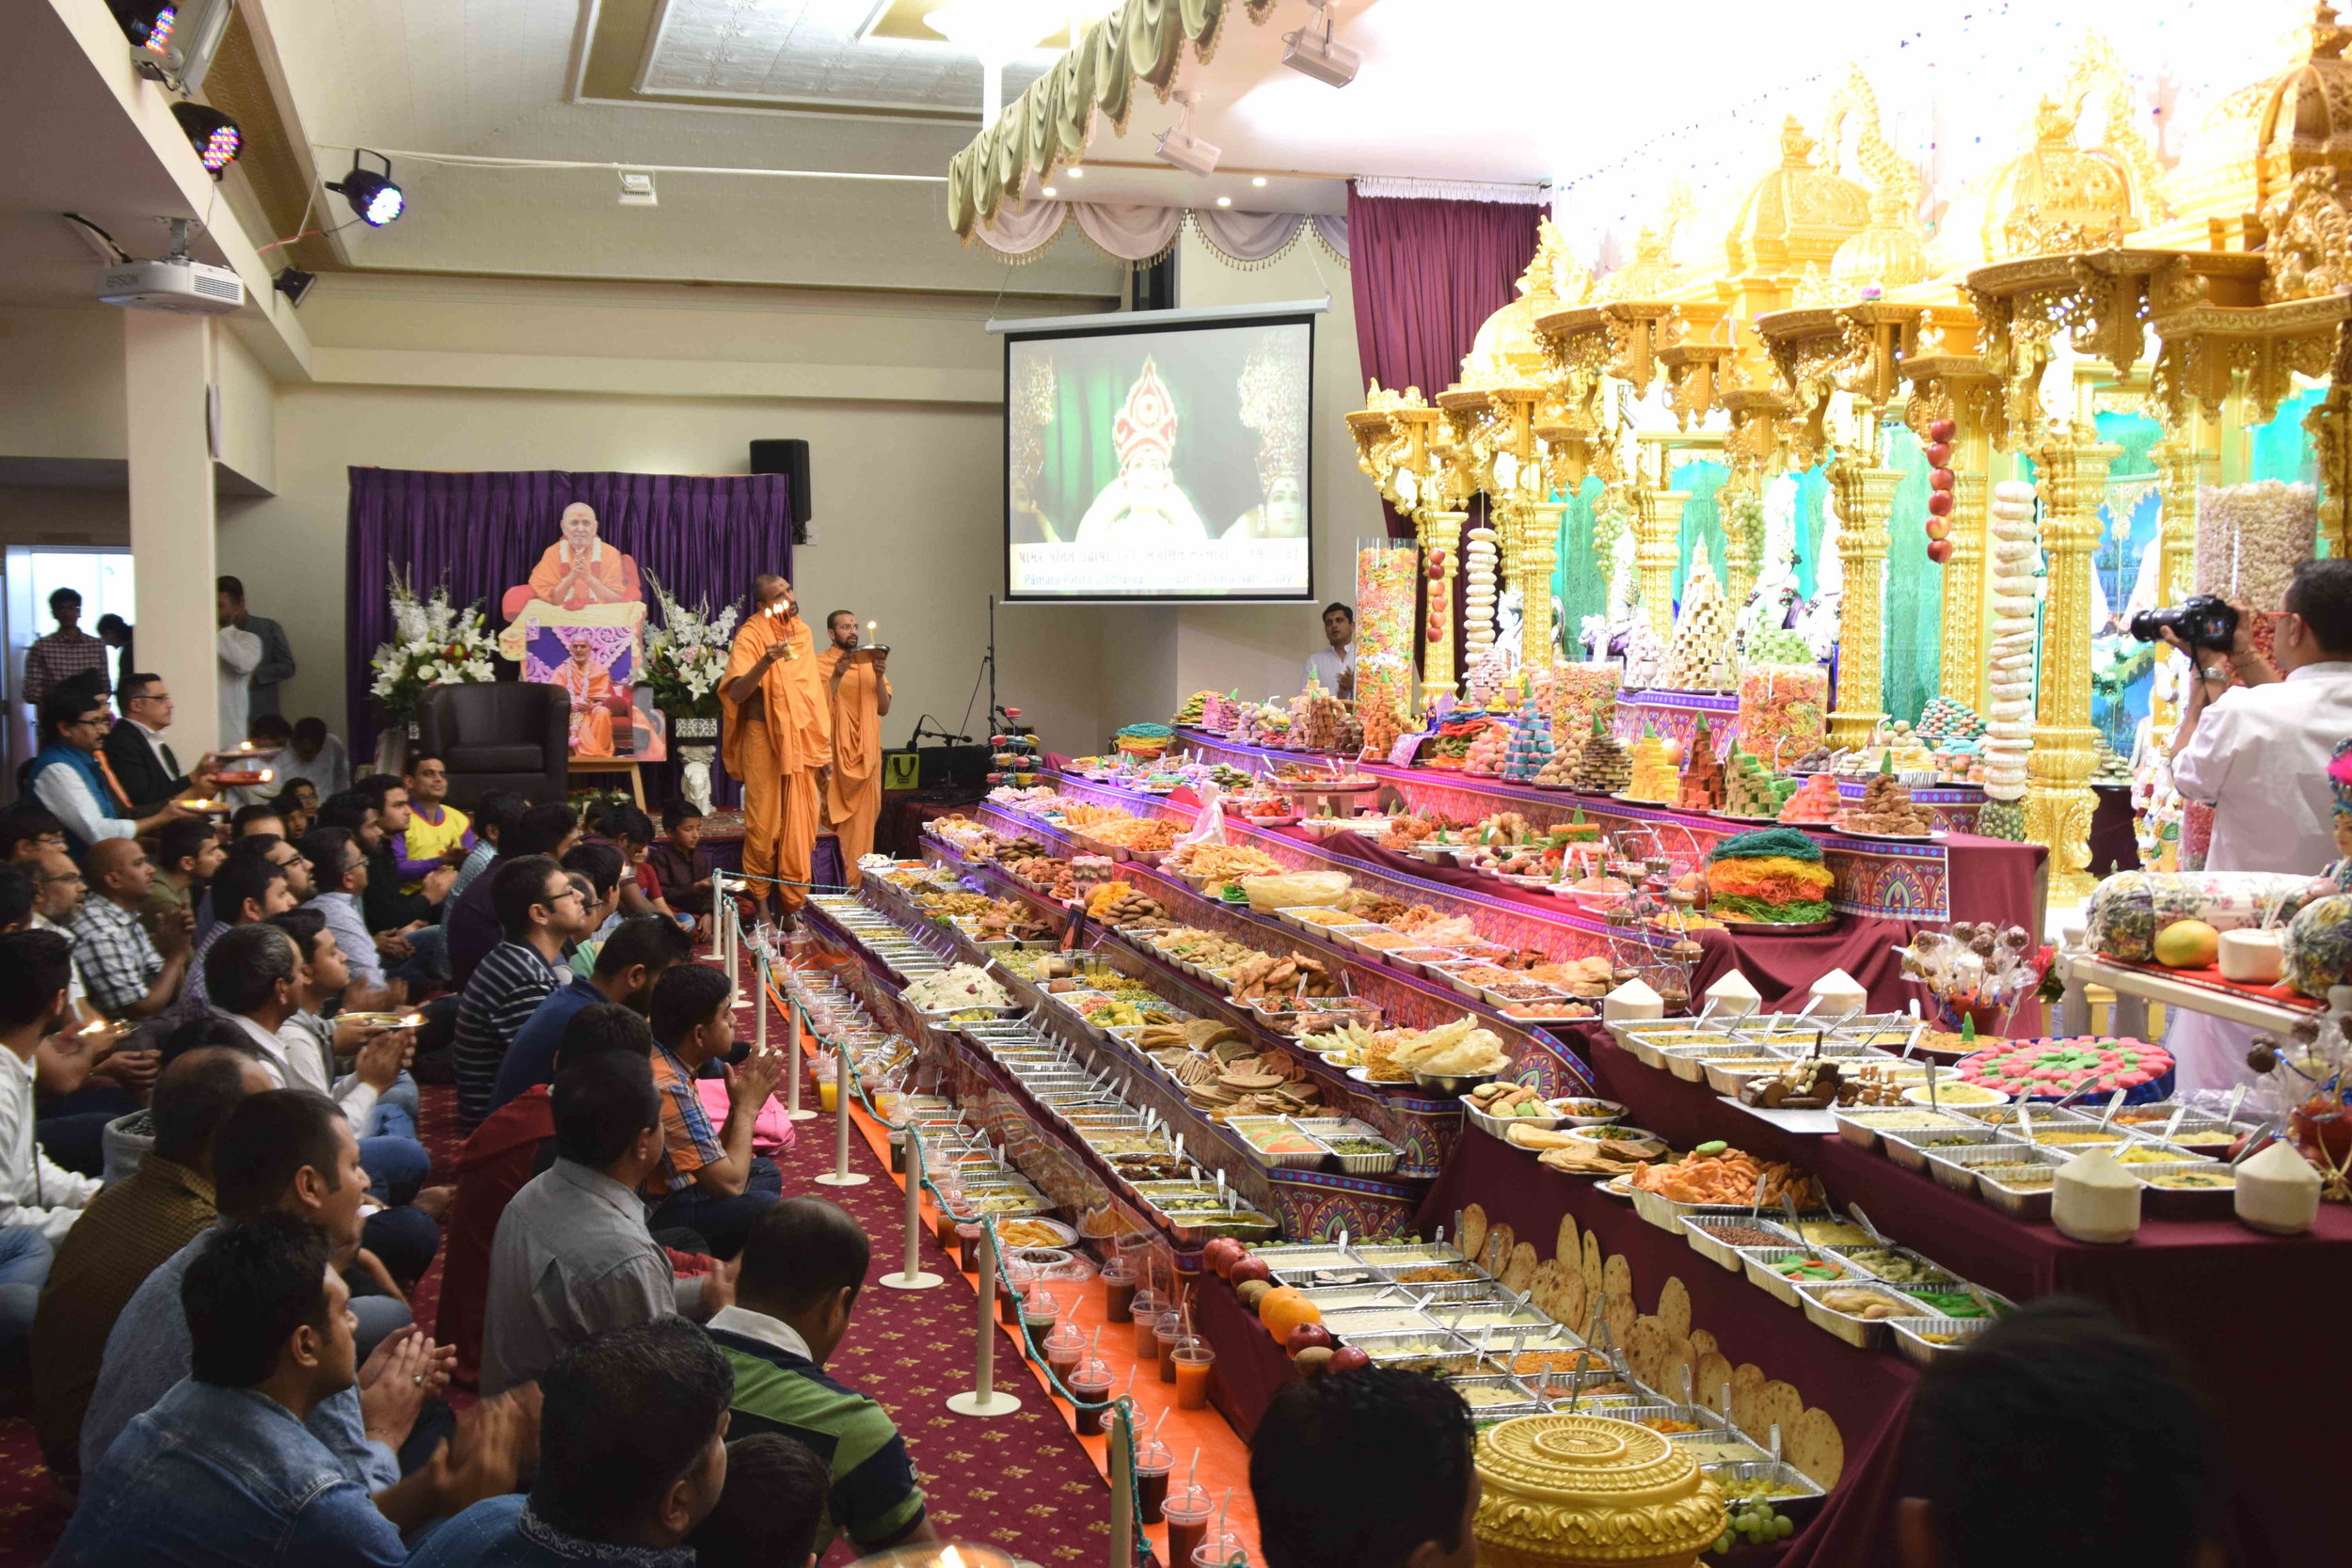 Paramchintan Swami and Adarshmuni Swami at the BAPS Shri Swaminarayan Mandir, Christchurch, Diwali and Annakut celebrations